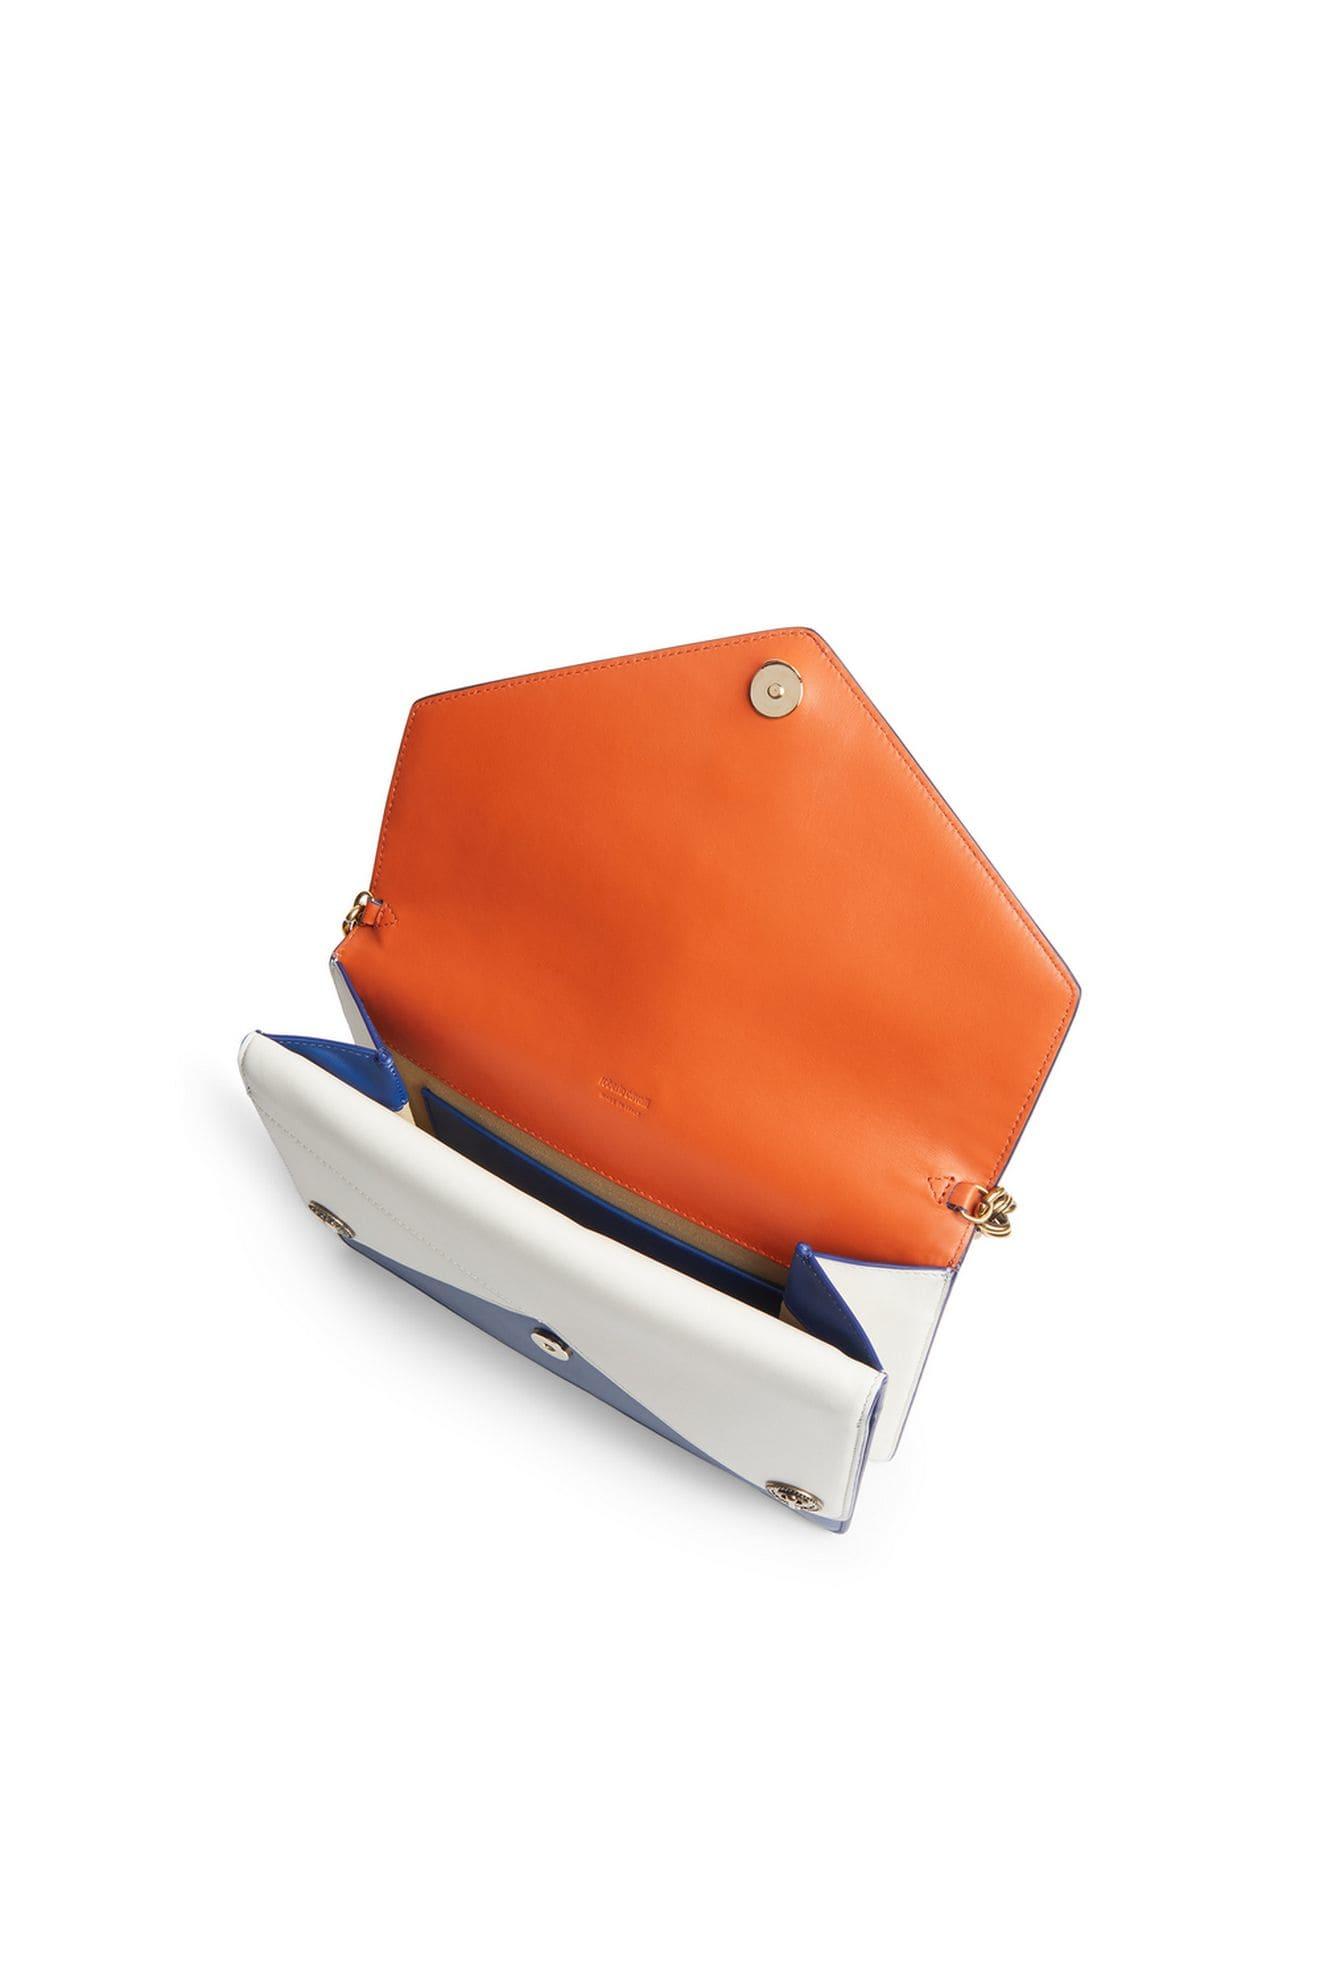 roberto-cavalli-medium-shoulder-bag-with-lucky-symbols_13151035_15413887_1320